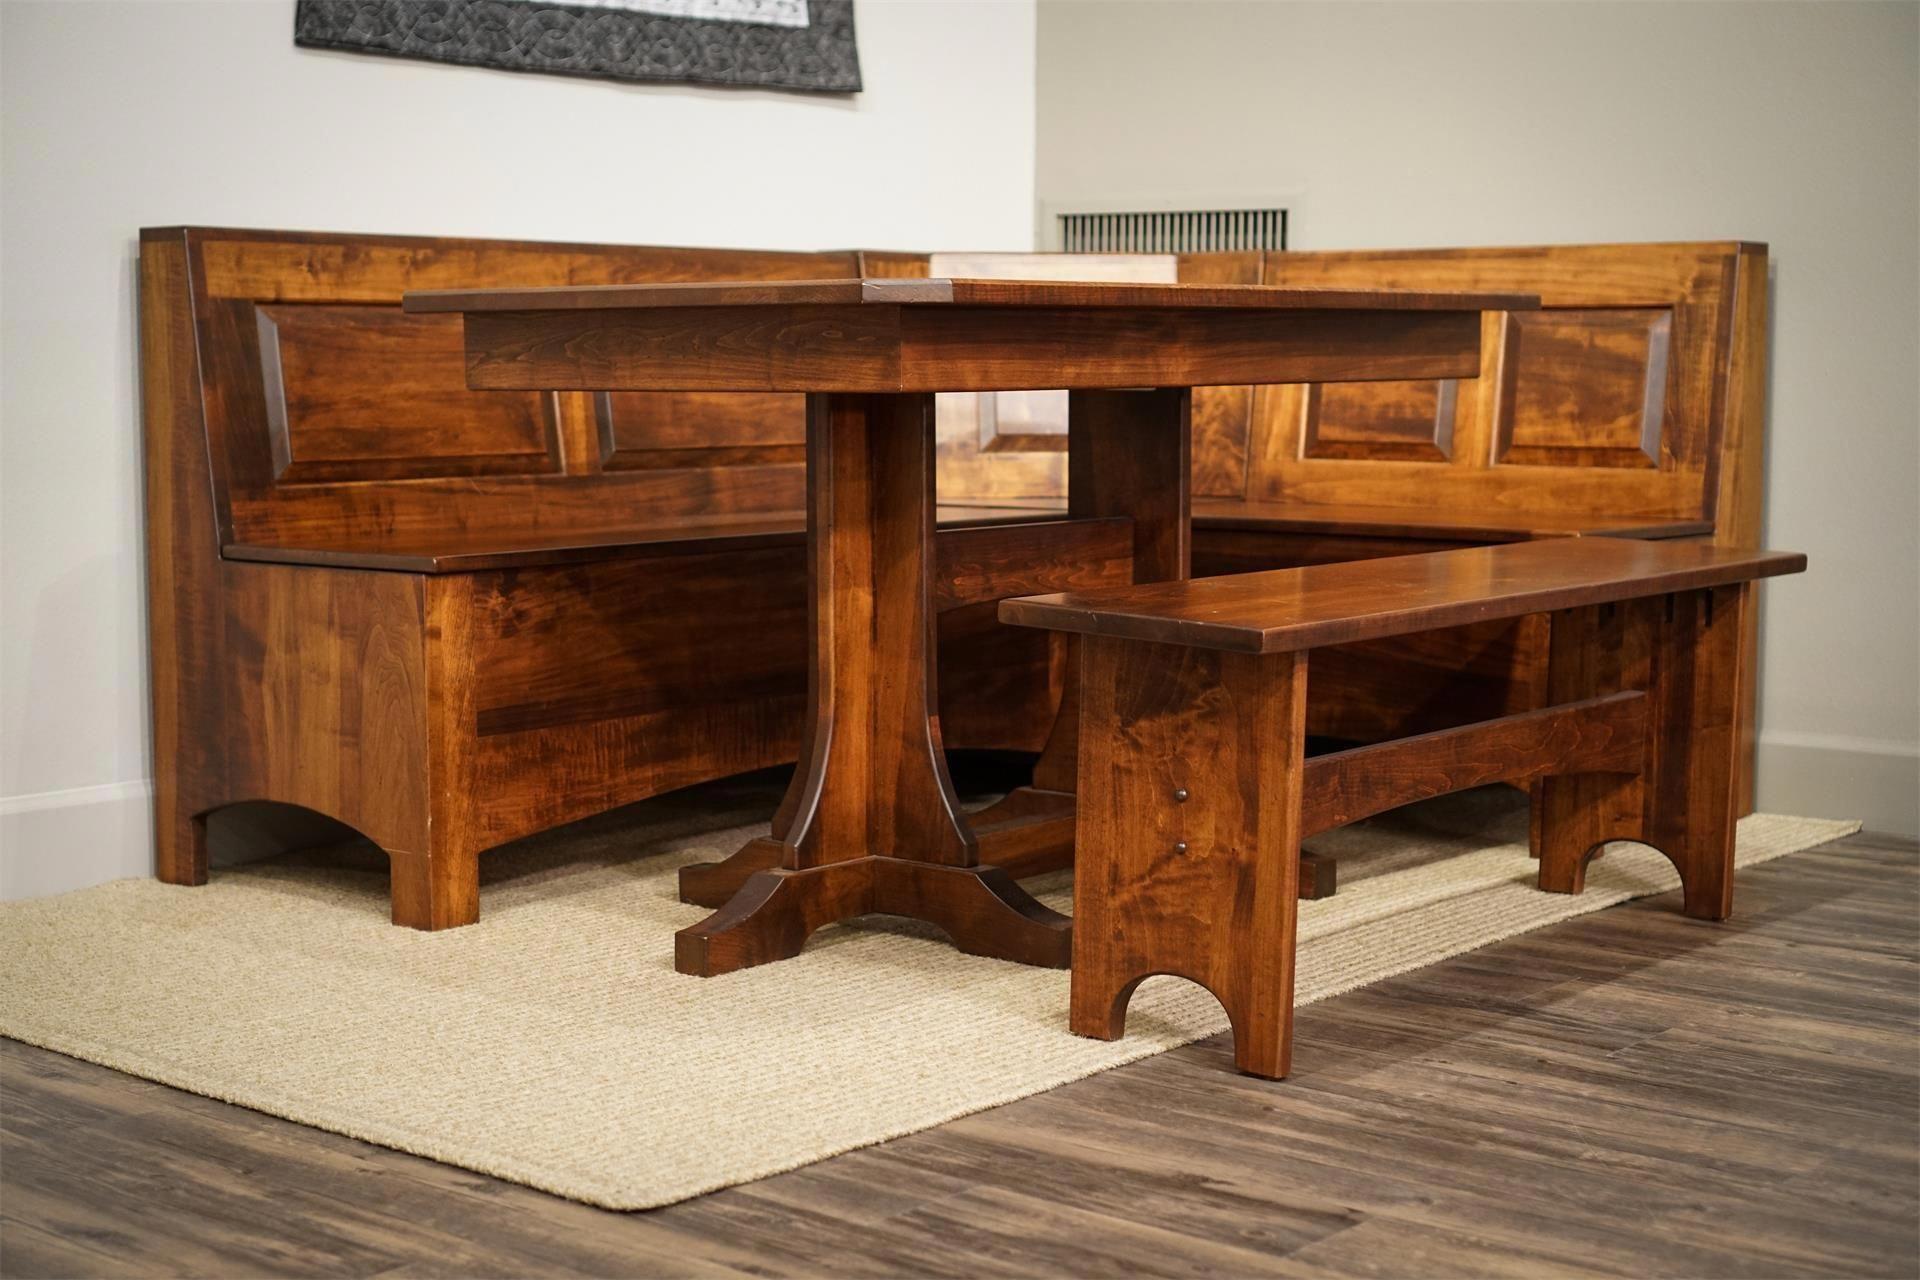 View This Corner Breakfast Nook Set At Our Brick And Mortar Amish Furniture In Sarasota Florida Furnitures